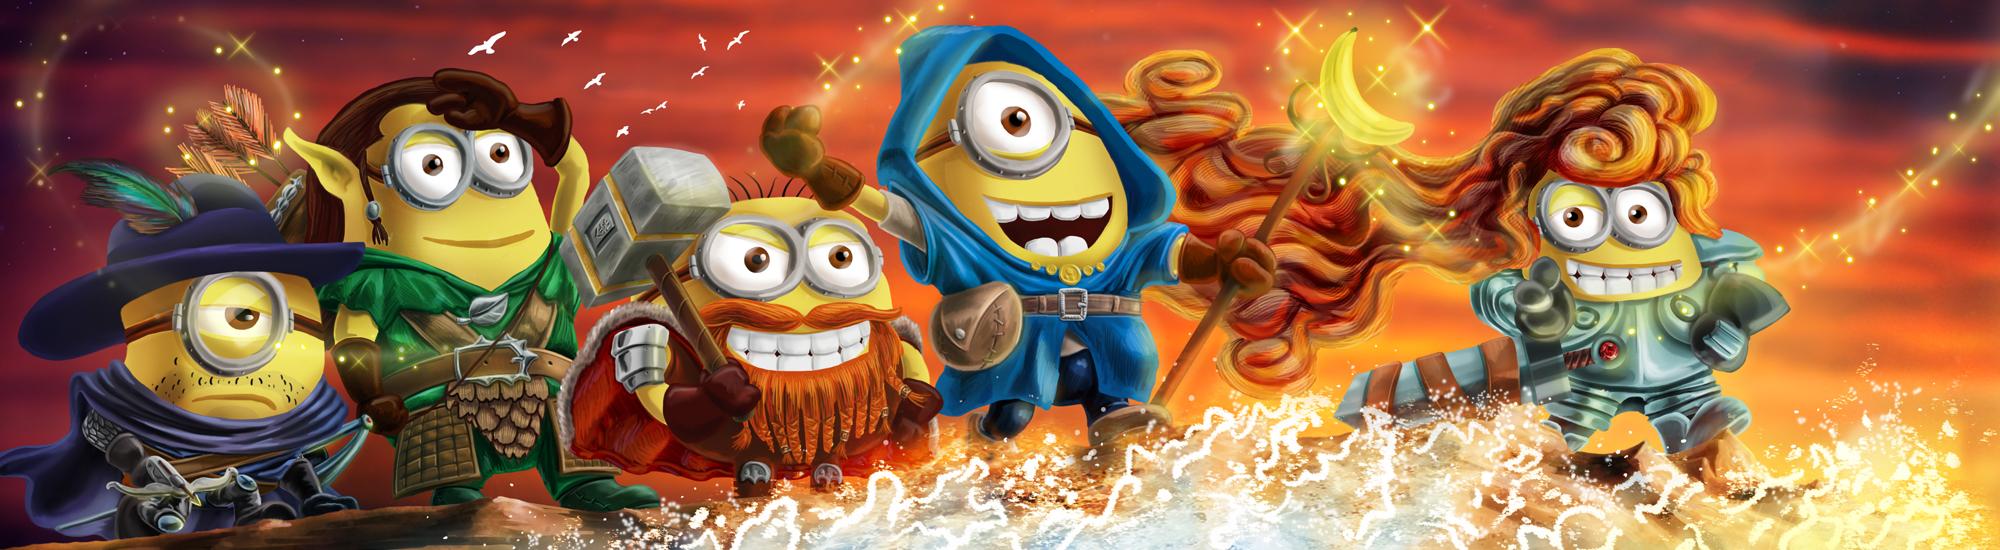 Minions on a Quest by Wonderwig